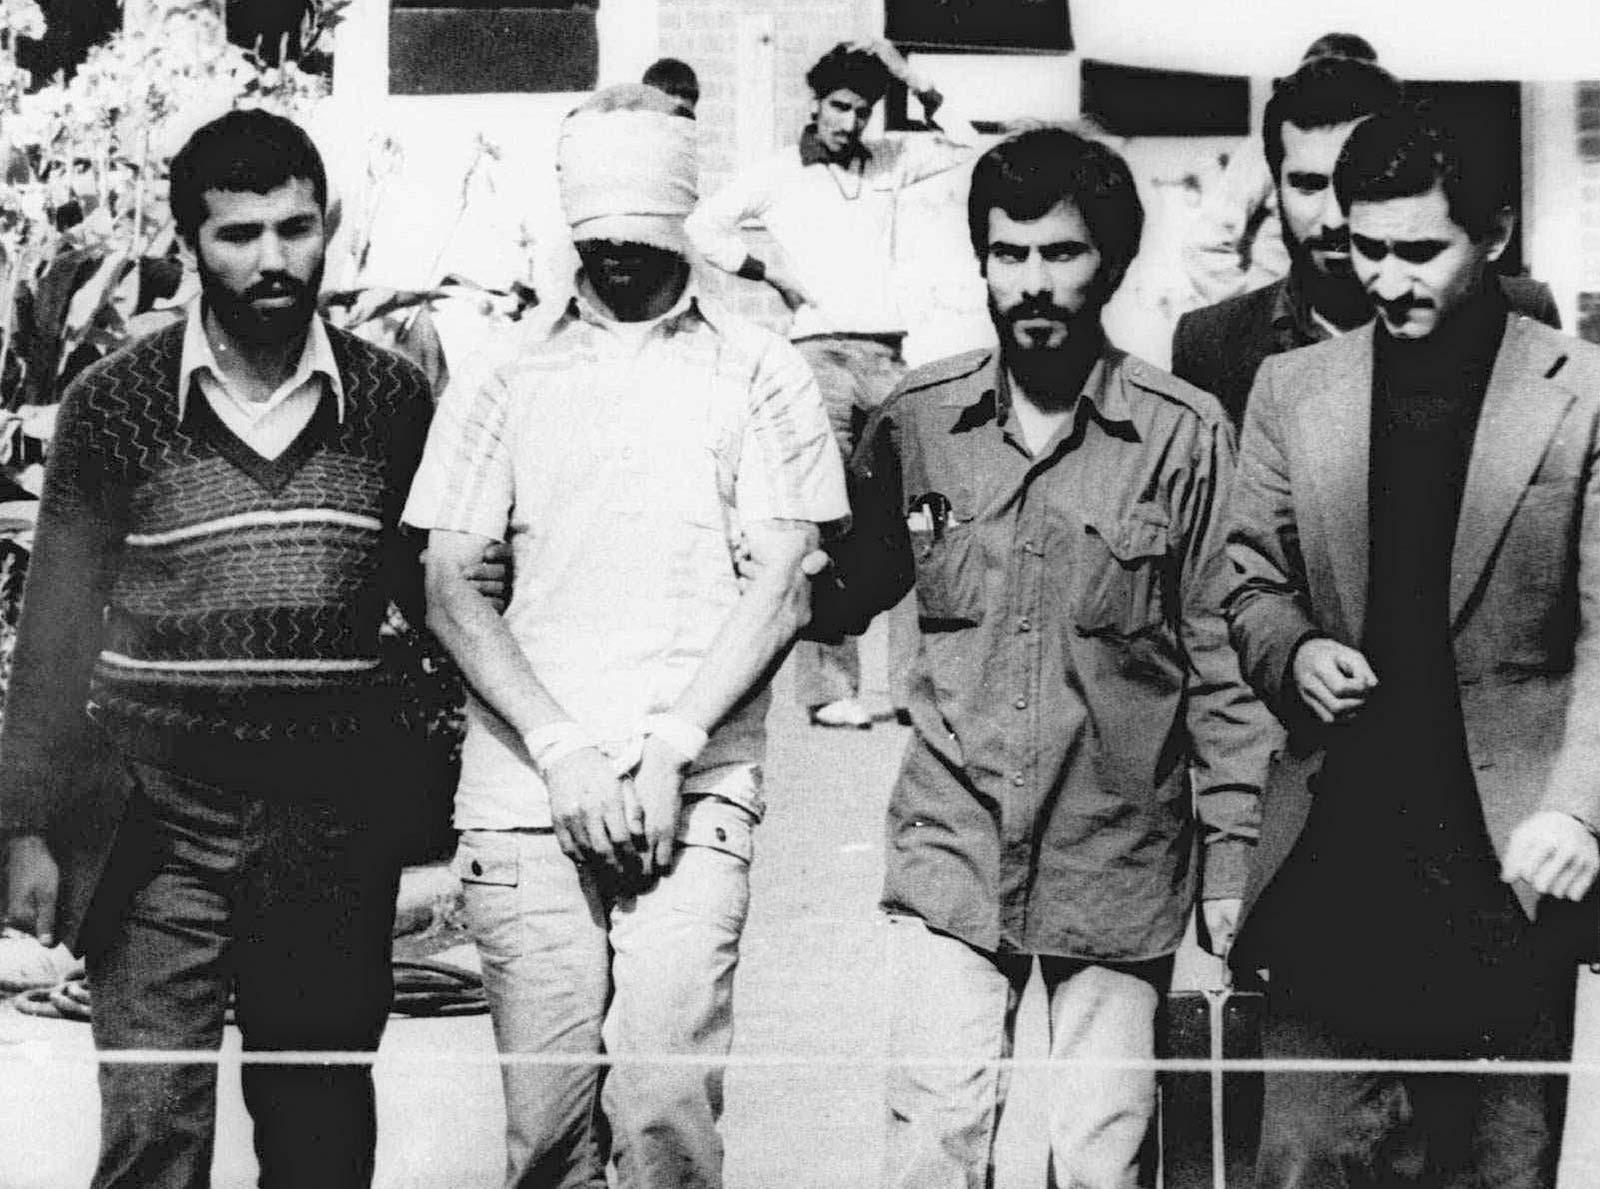 hostage-American-captors-embassy-Iranian-Tehran-November-9-1979 (1)